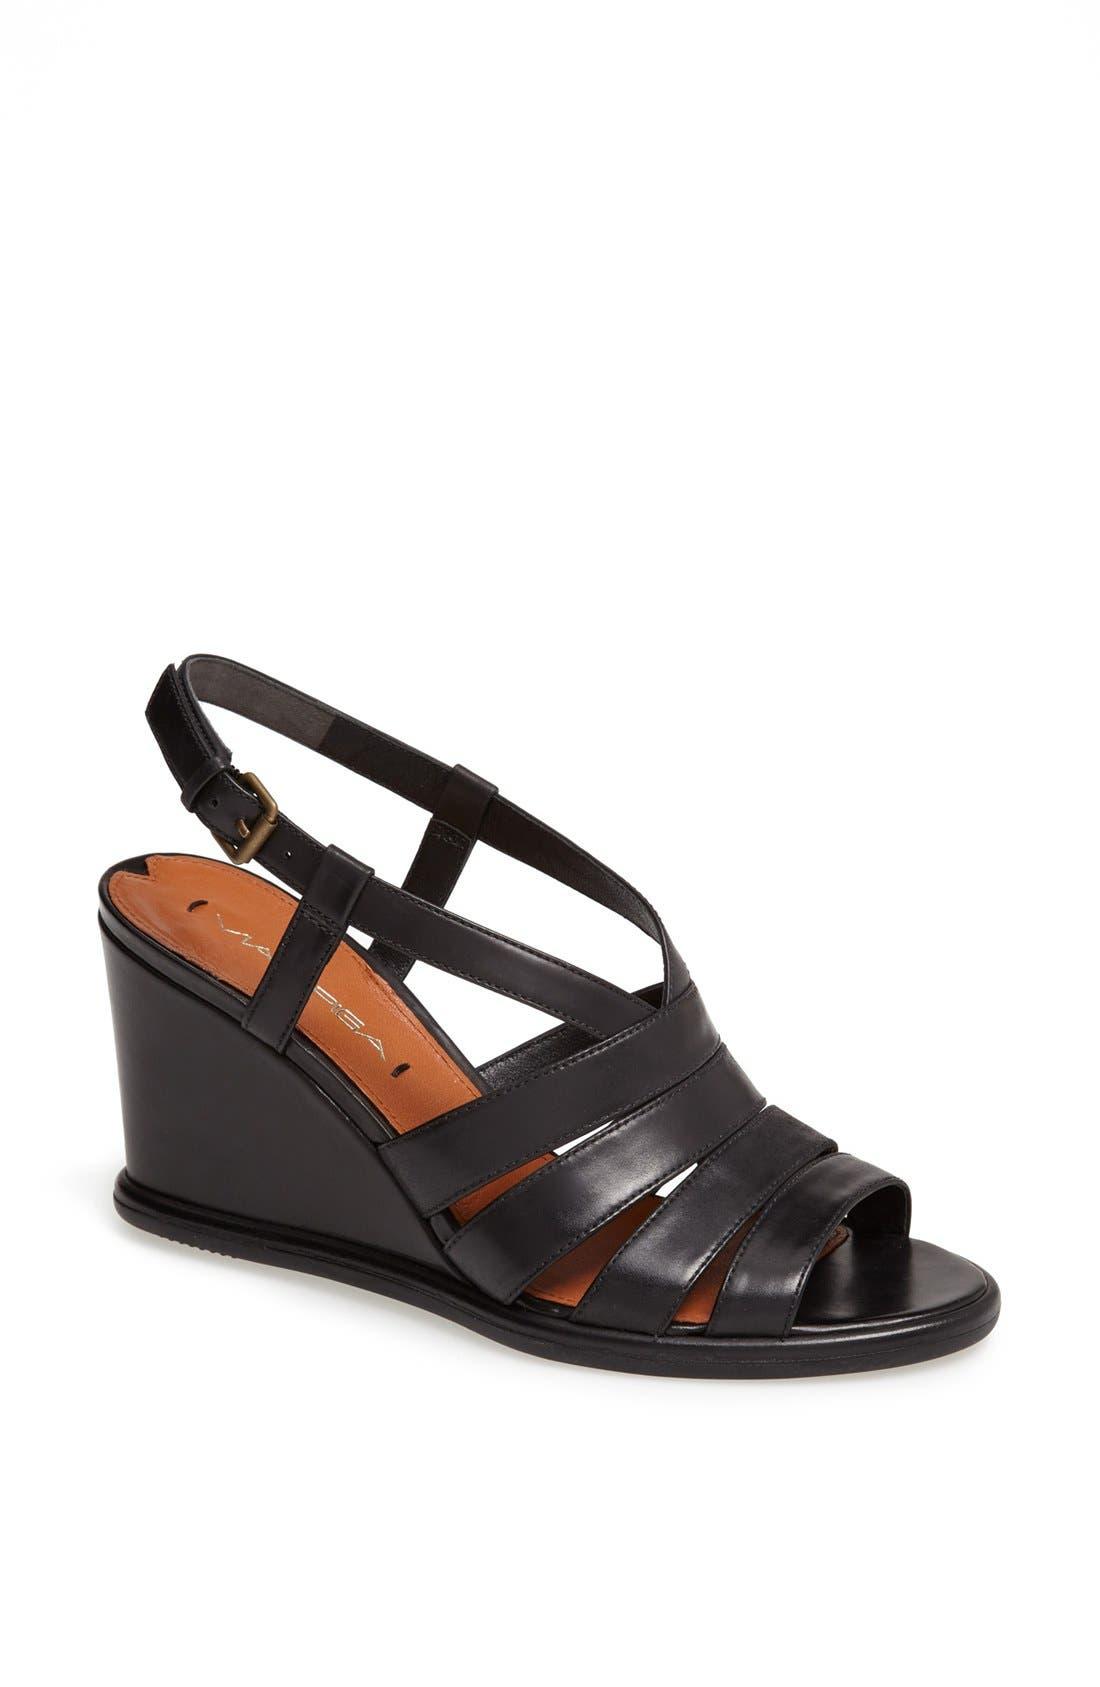 Main Image - Via Spiga 'Damara' Wedge Sandal